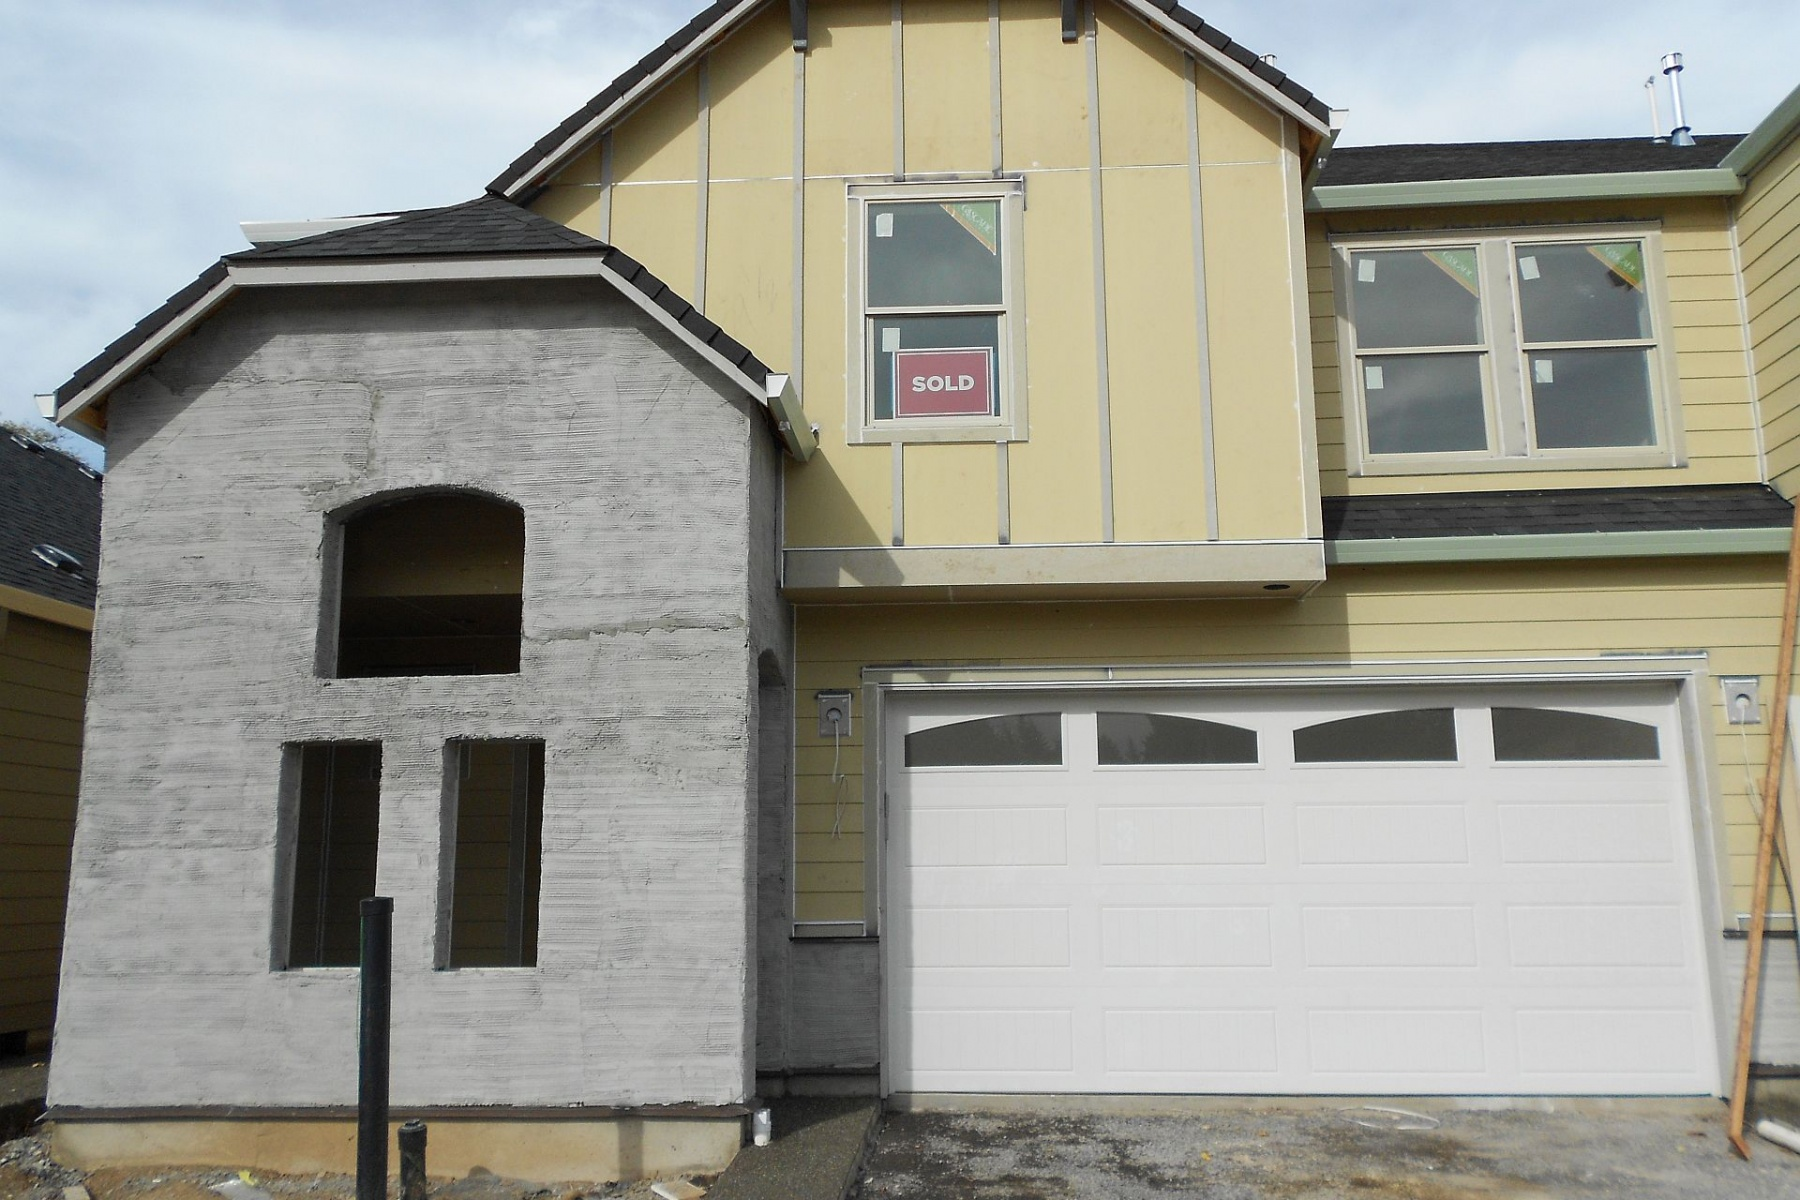 Single Family Home for Sale at 5749 NW 26th, CAMAS, WA 5749 NW 26th Ave Camas, Washington 98607 United States